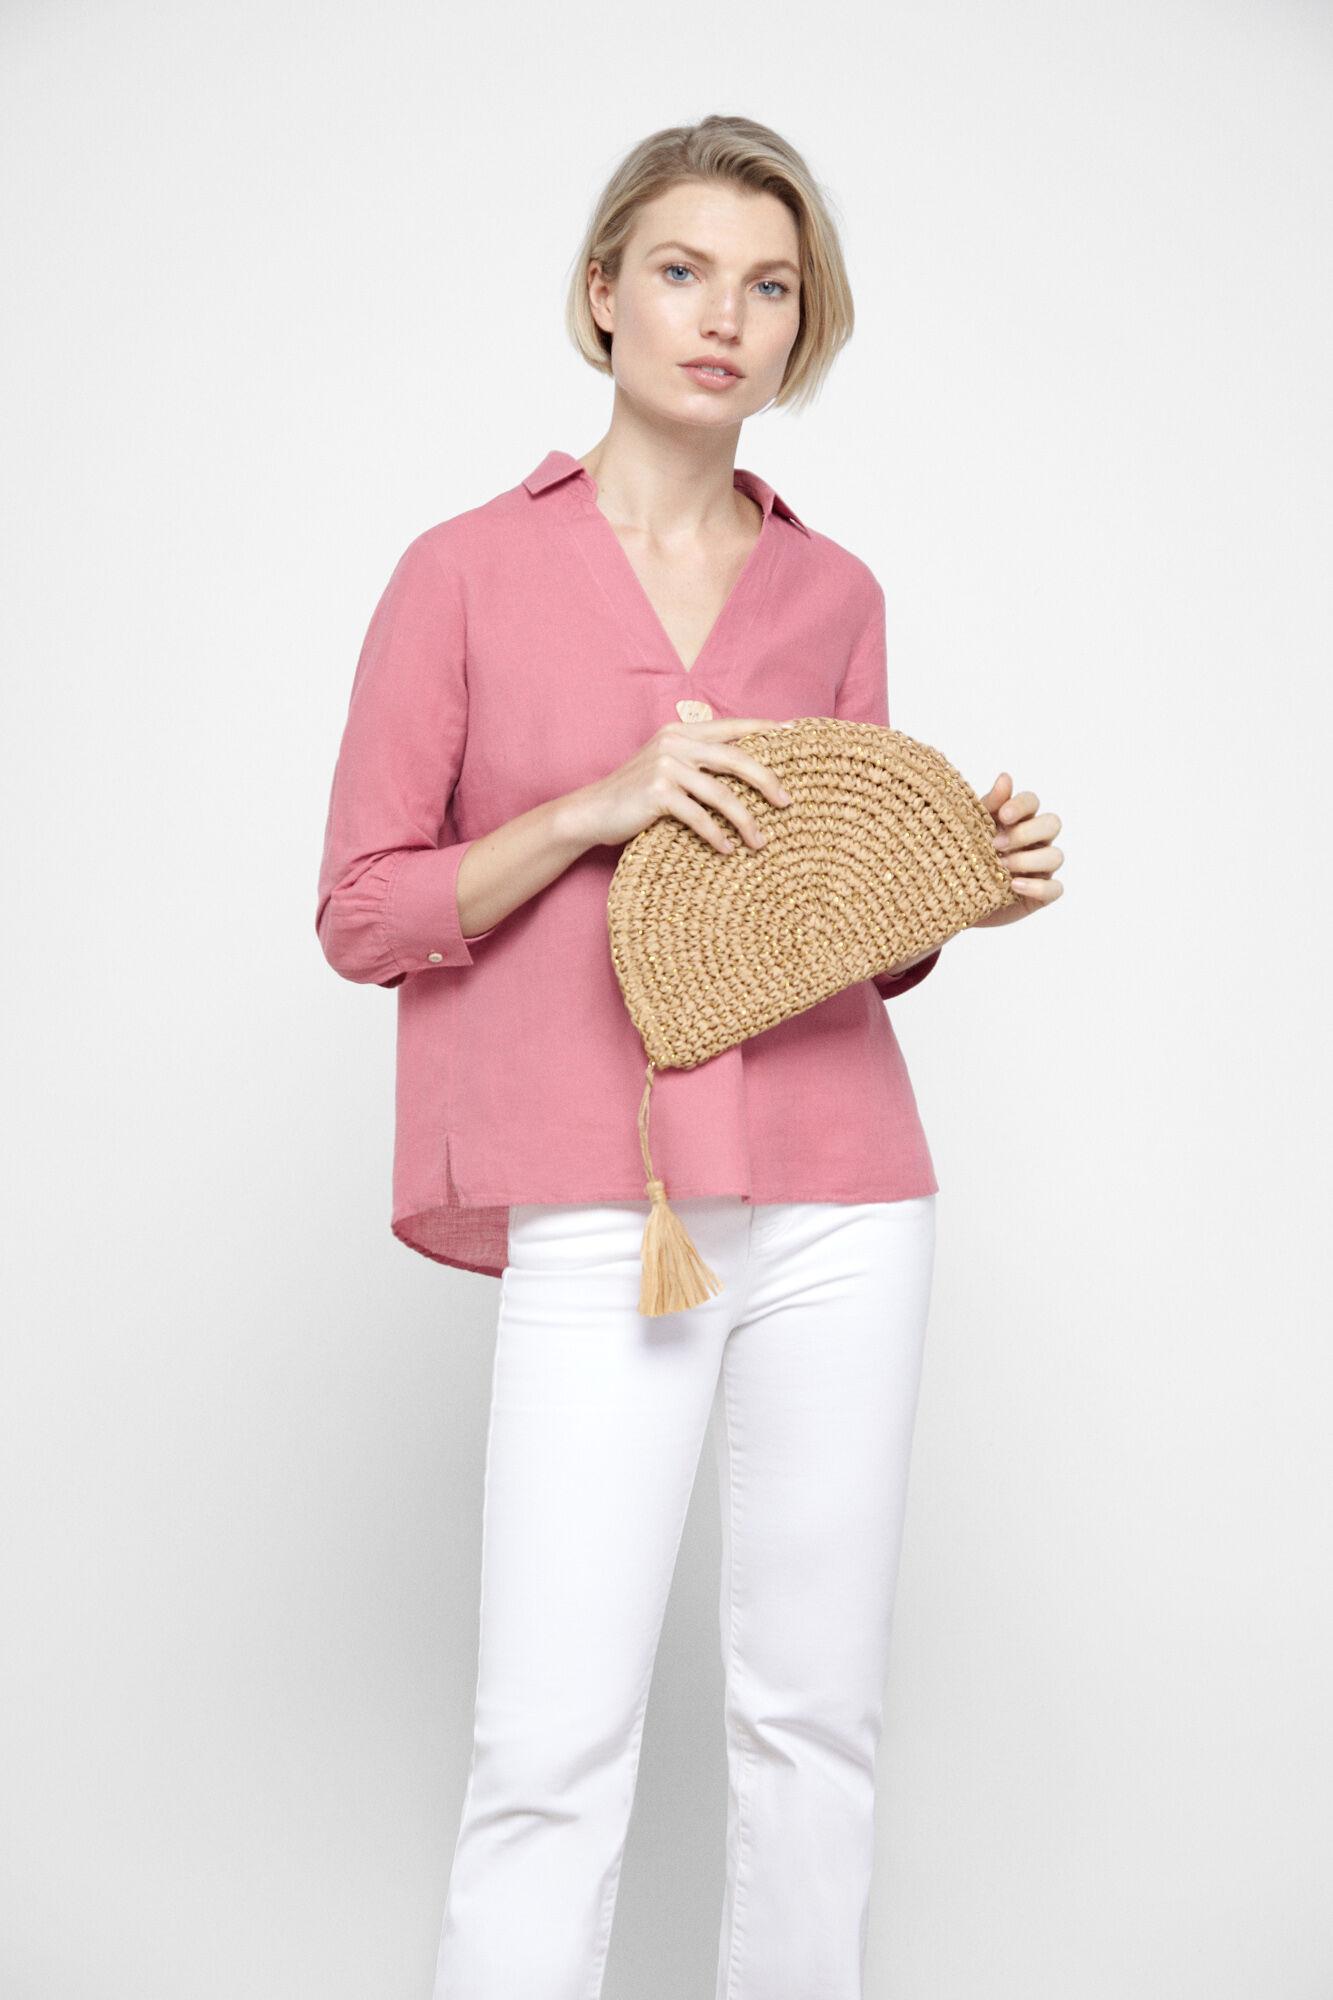 Springfield Women 3.Mochila Nylon Acolchada Bag